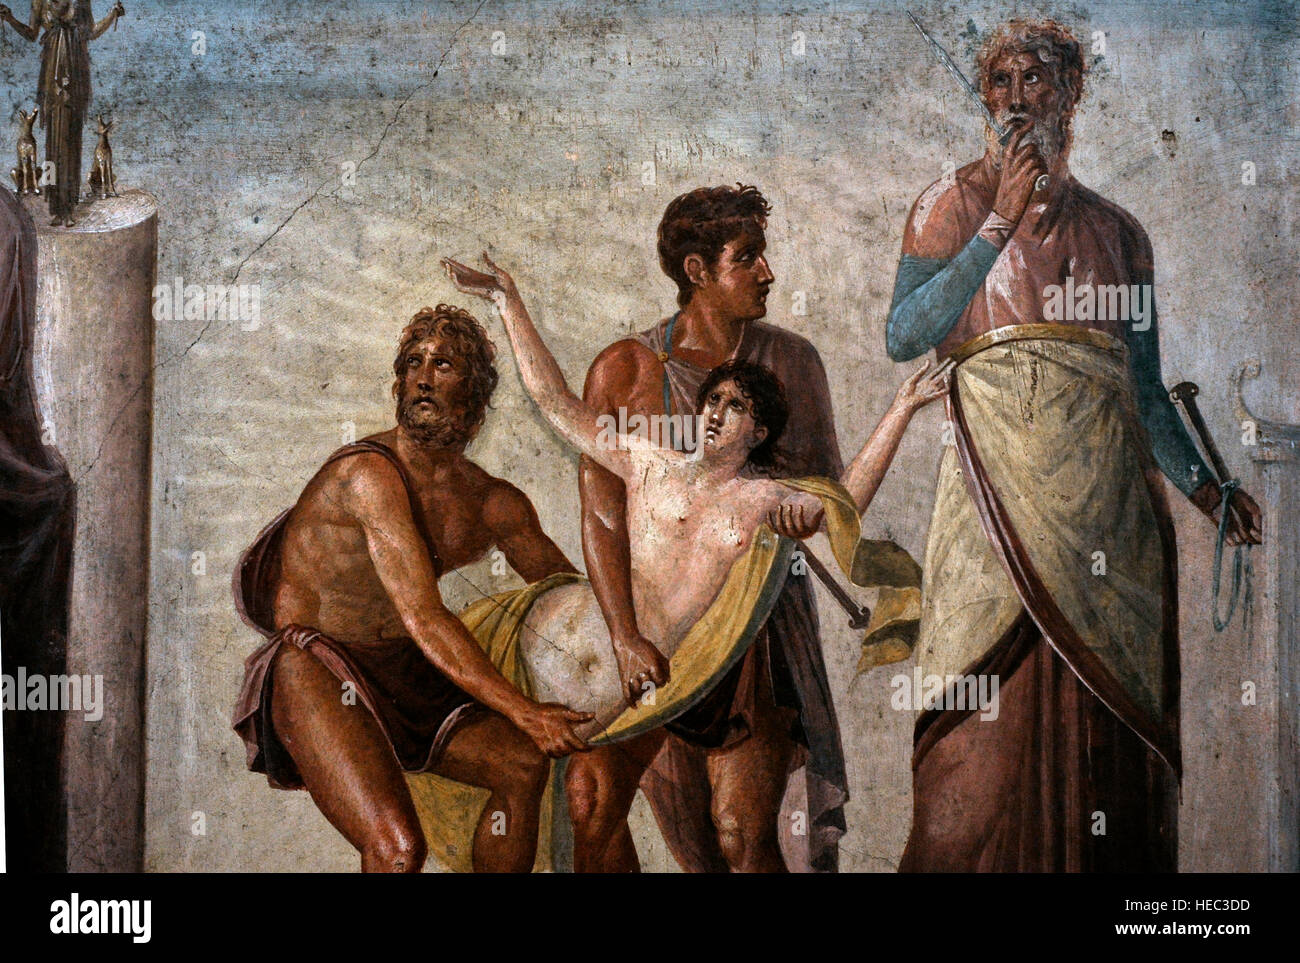 The Sacrifice of Iphigenia. House of the Tragic Poet. Pompeii, Italy. 1st century AD. National Archaeological Museum, - Stock Image